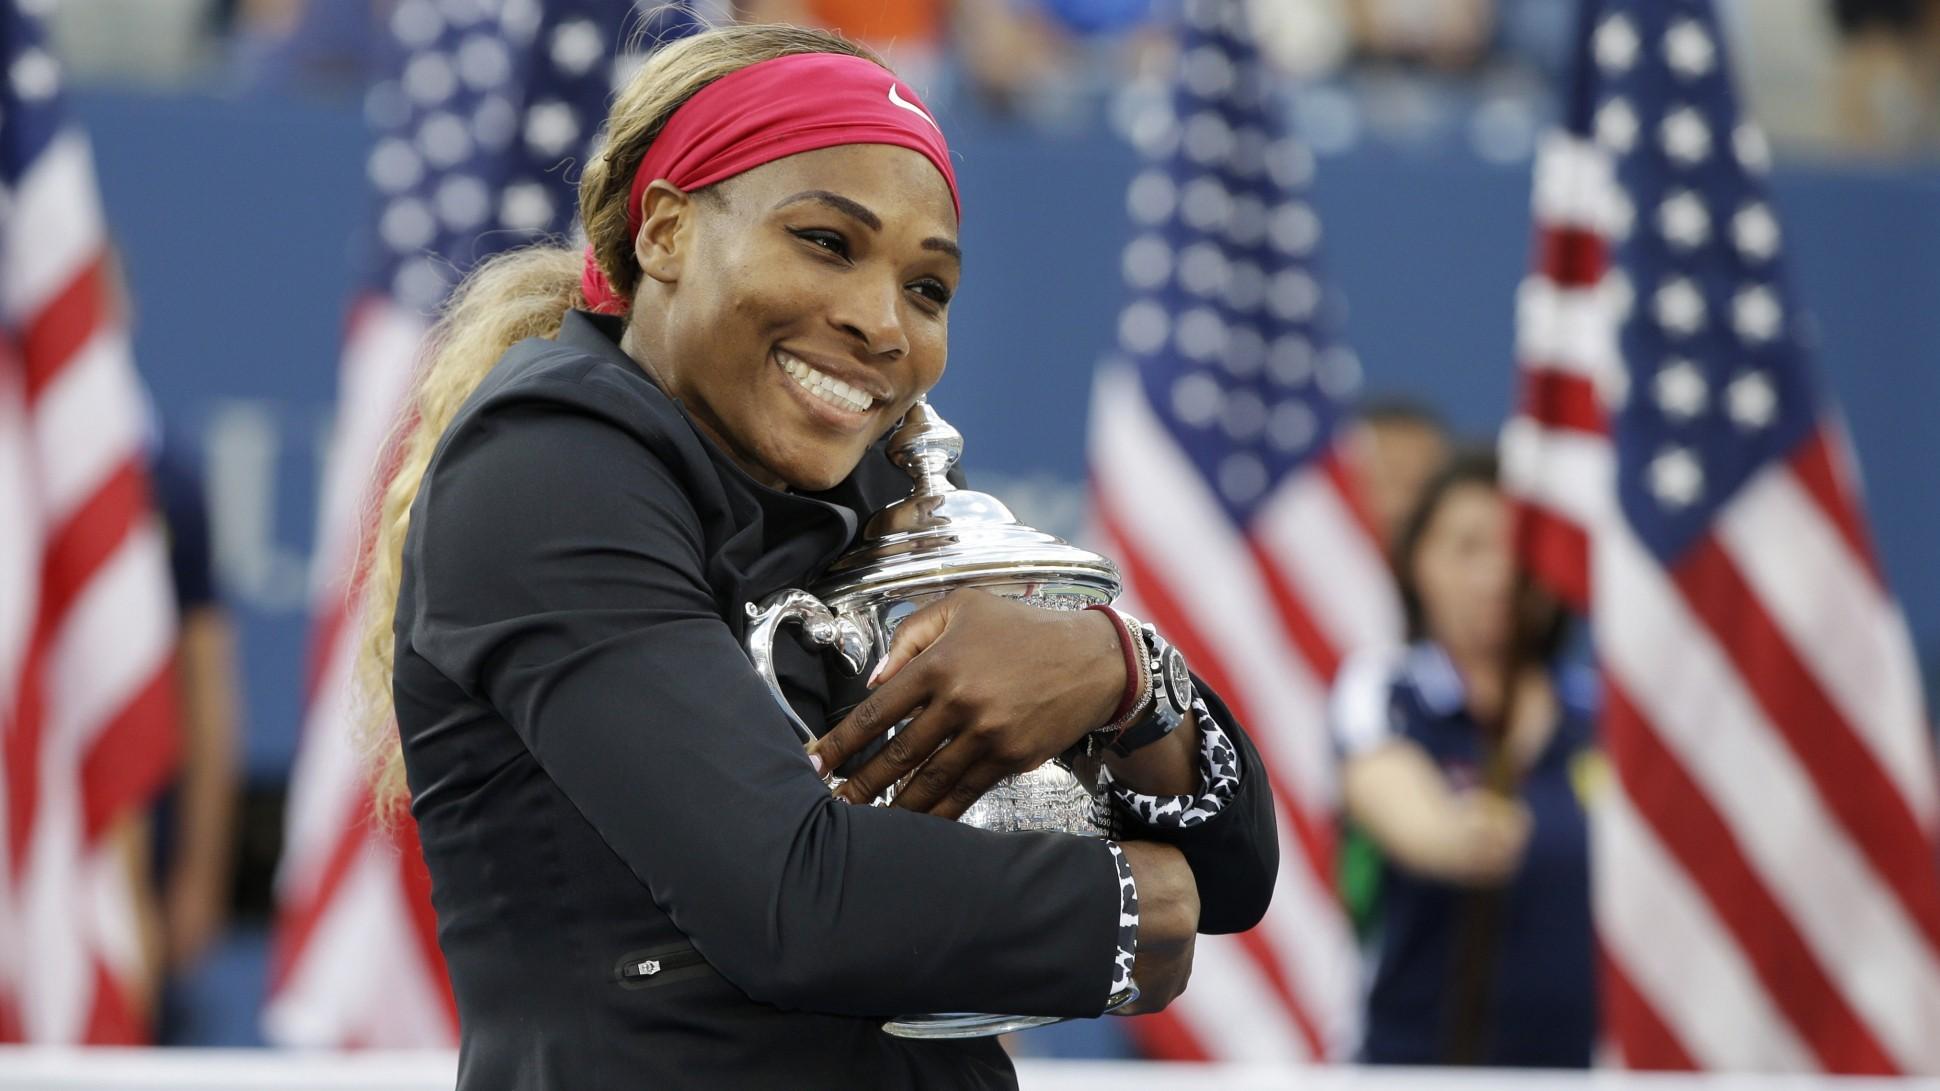 Pictures of Serena Williams